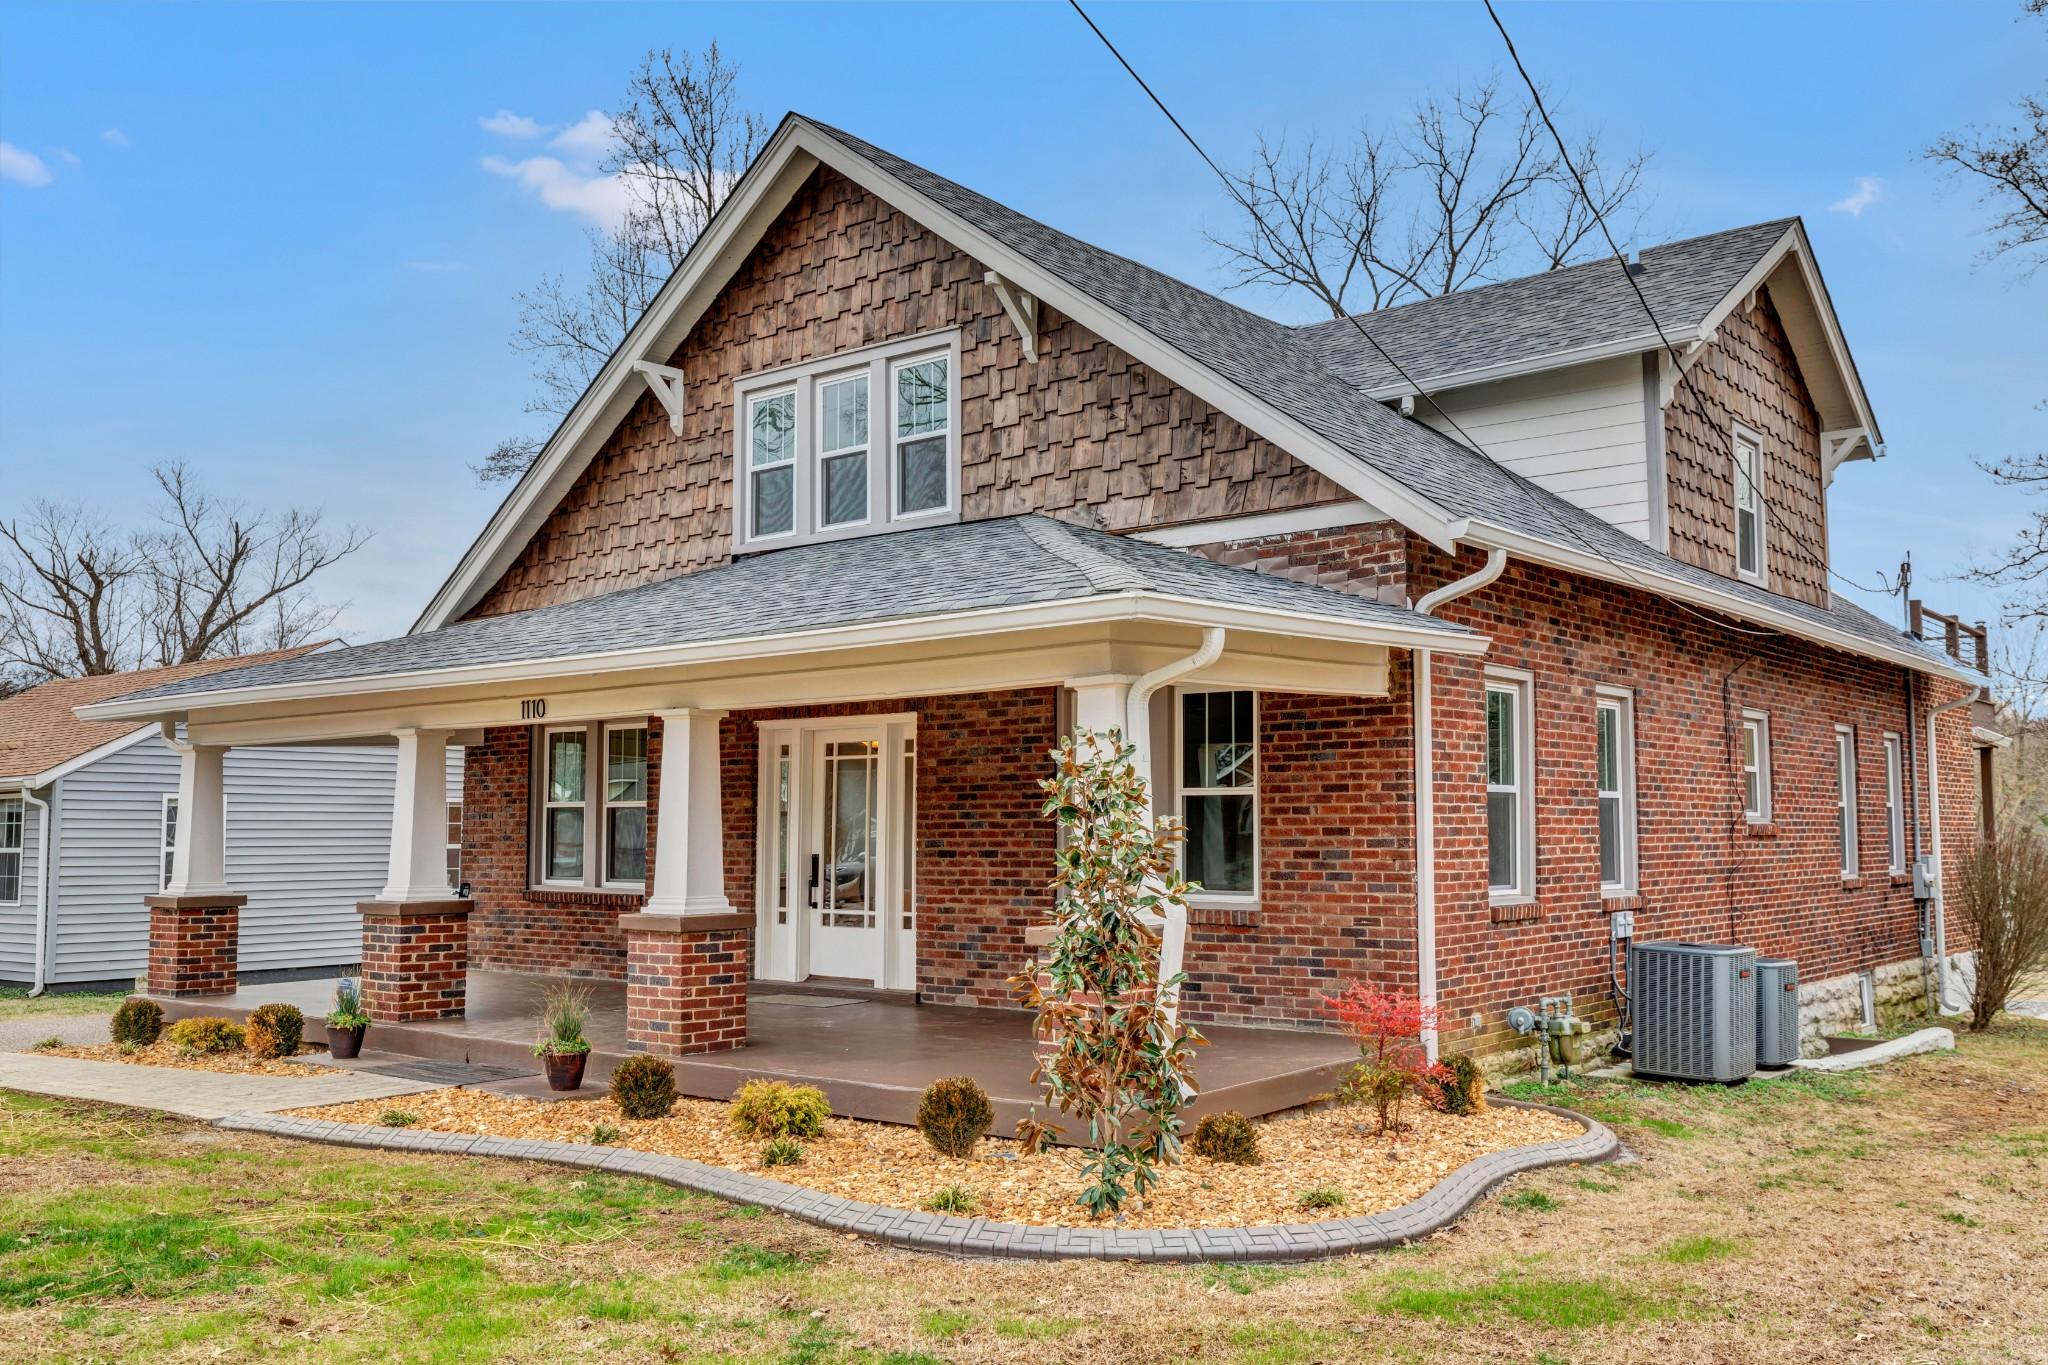 1110 Marion Ave, Nashville, TN 37216 - Nashville, TN real estate listing